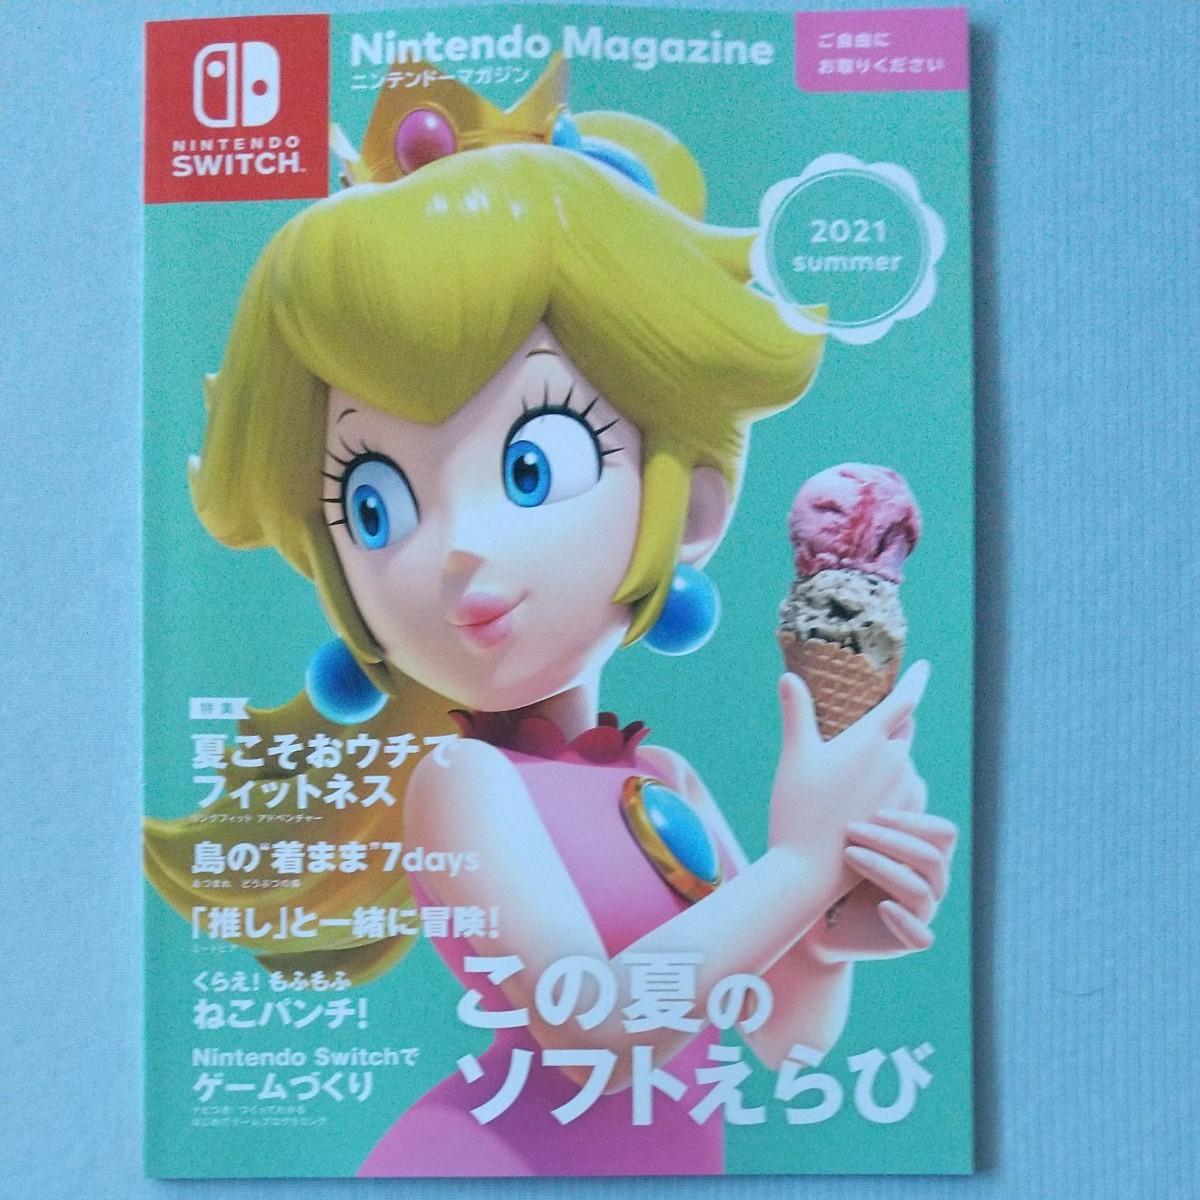 Nintendo Magojin ニンテンドーマガジン 2021 summer